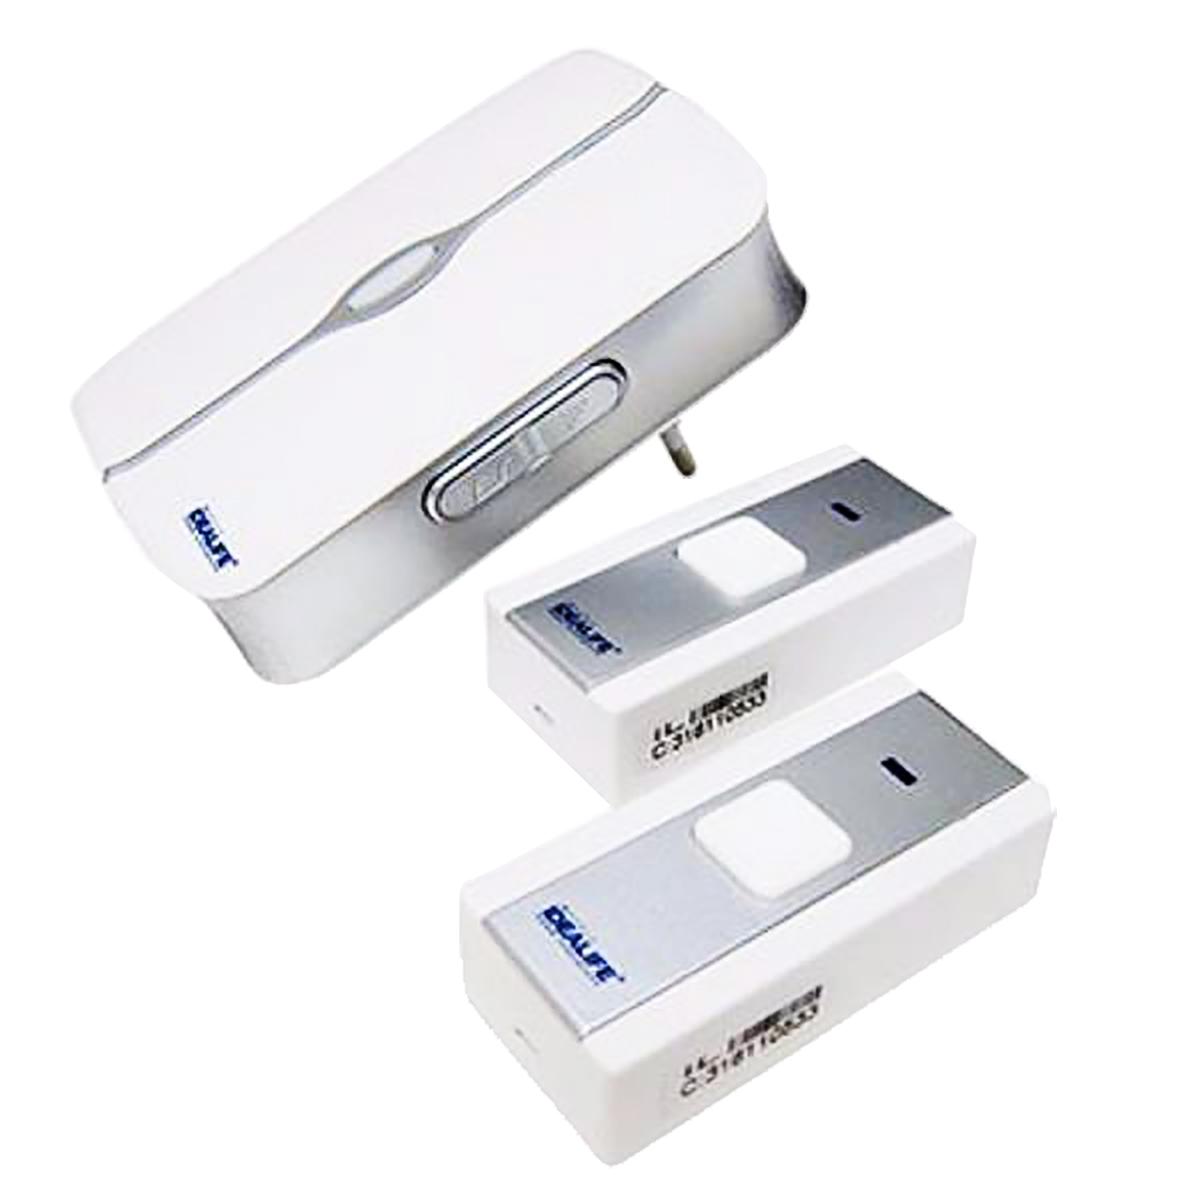 Wireless Doorbell 2 Remote (IL-292) / Bel Pintu Listrik 2 Remote   IDEALIFE